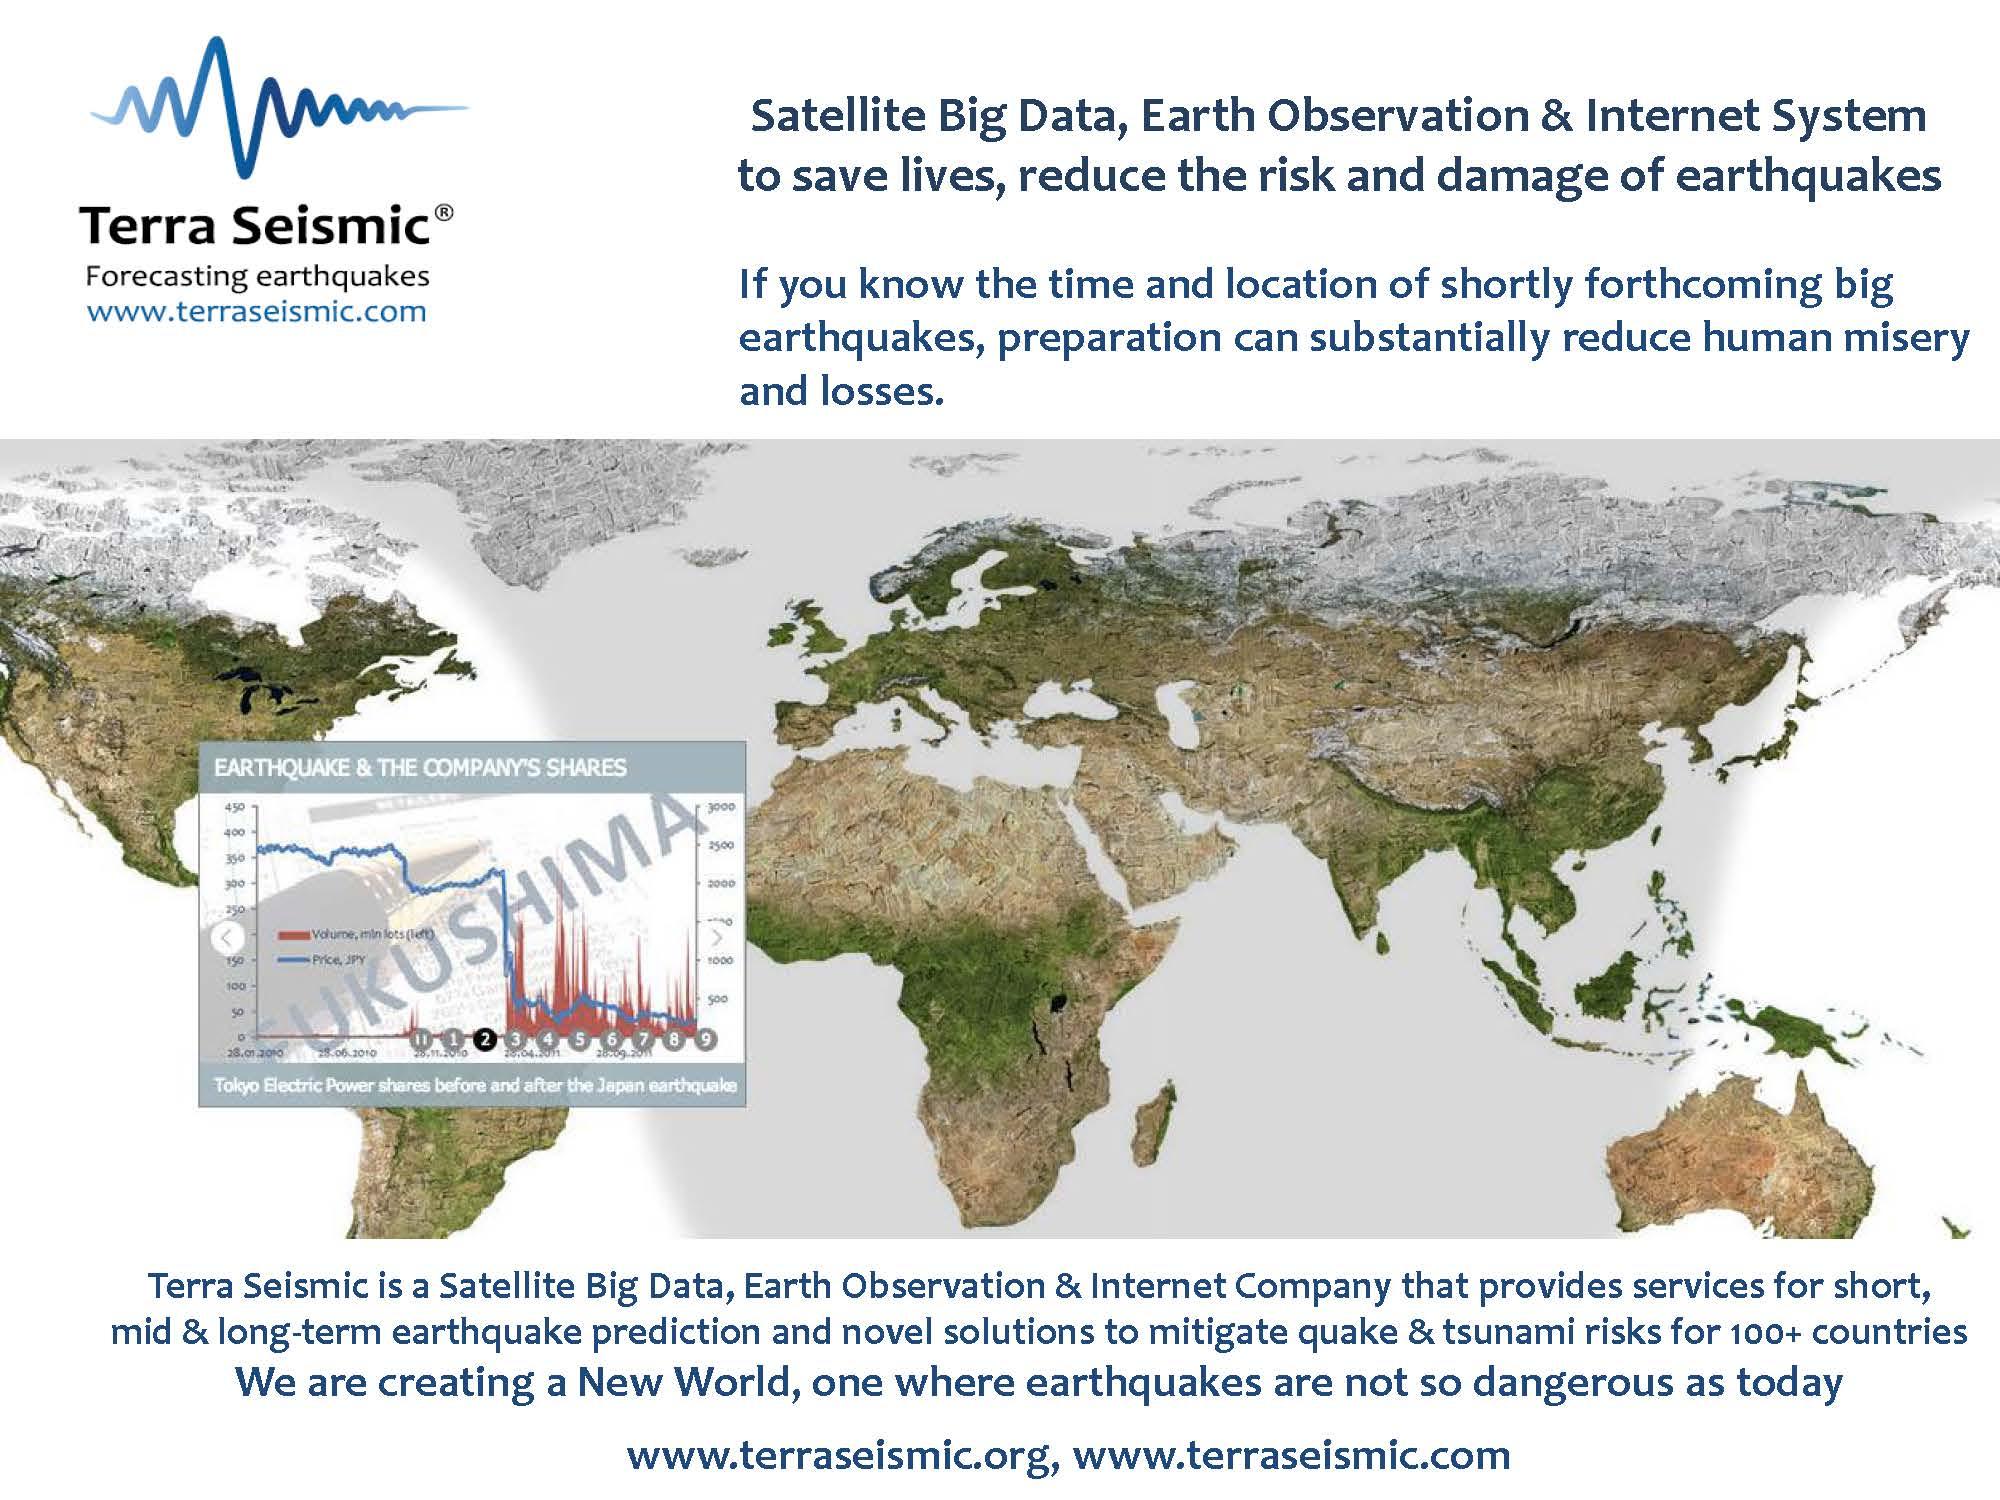 Terra Seismic